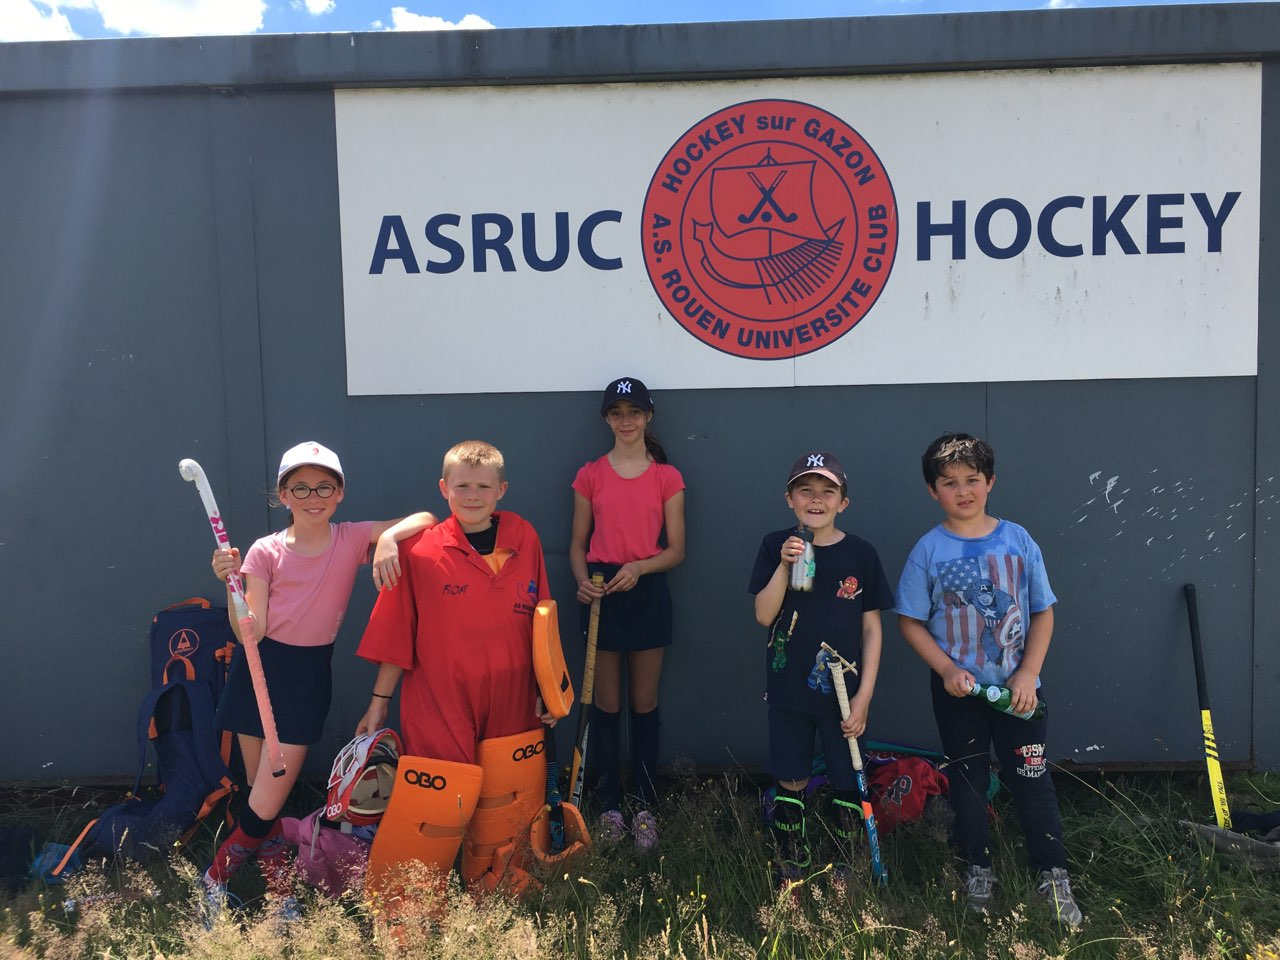 L'ASRUC Hockey sur gazon